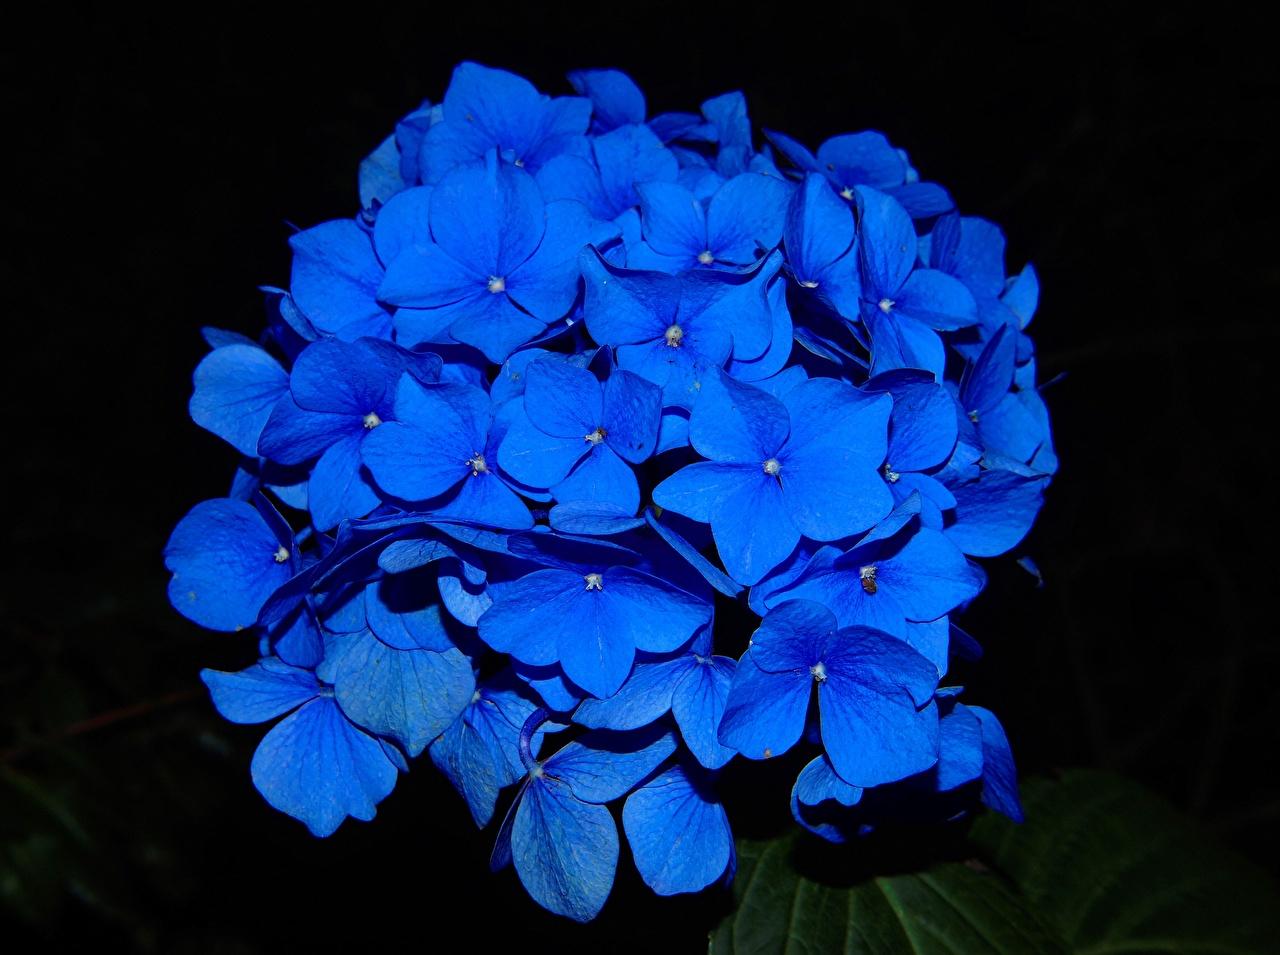 Image Blue Flowers Hydrangea Closeup Black background flower